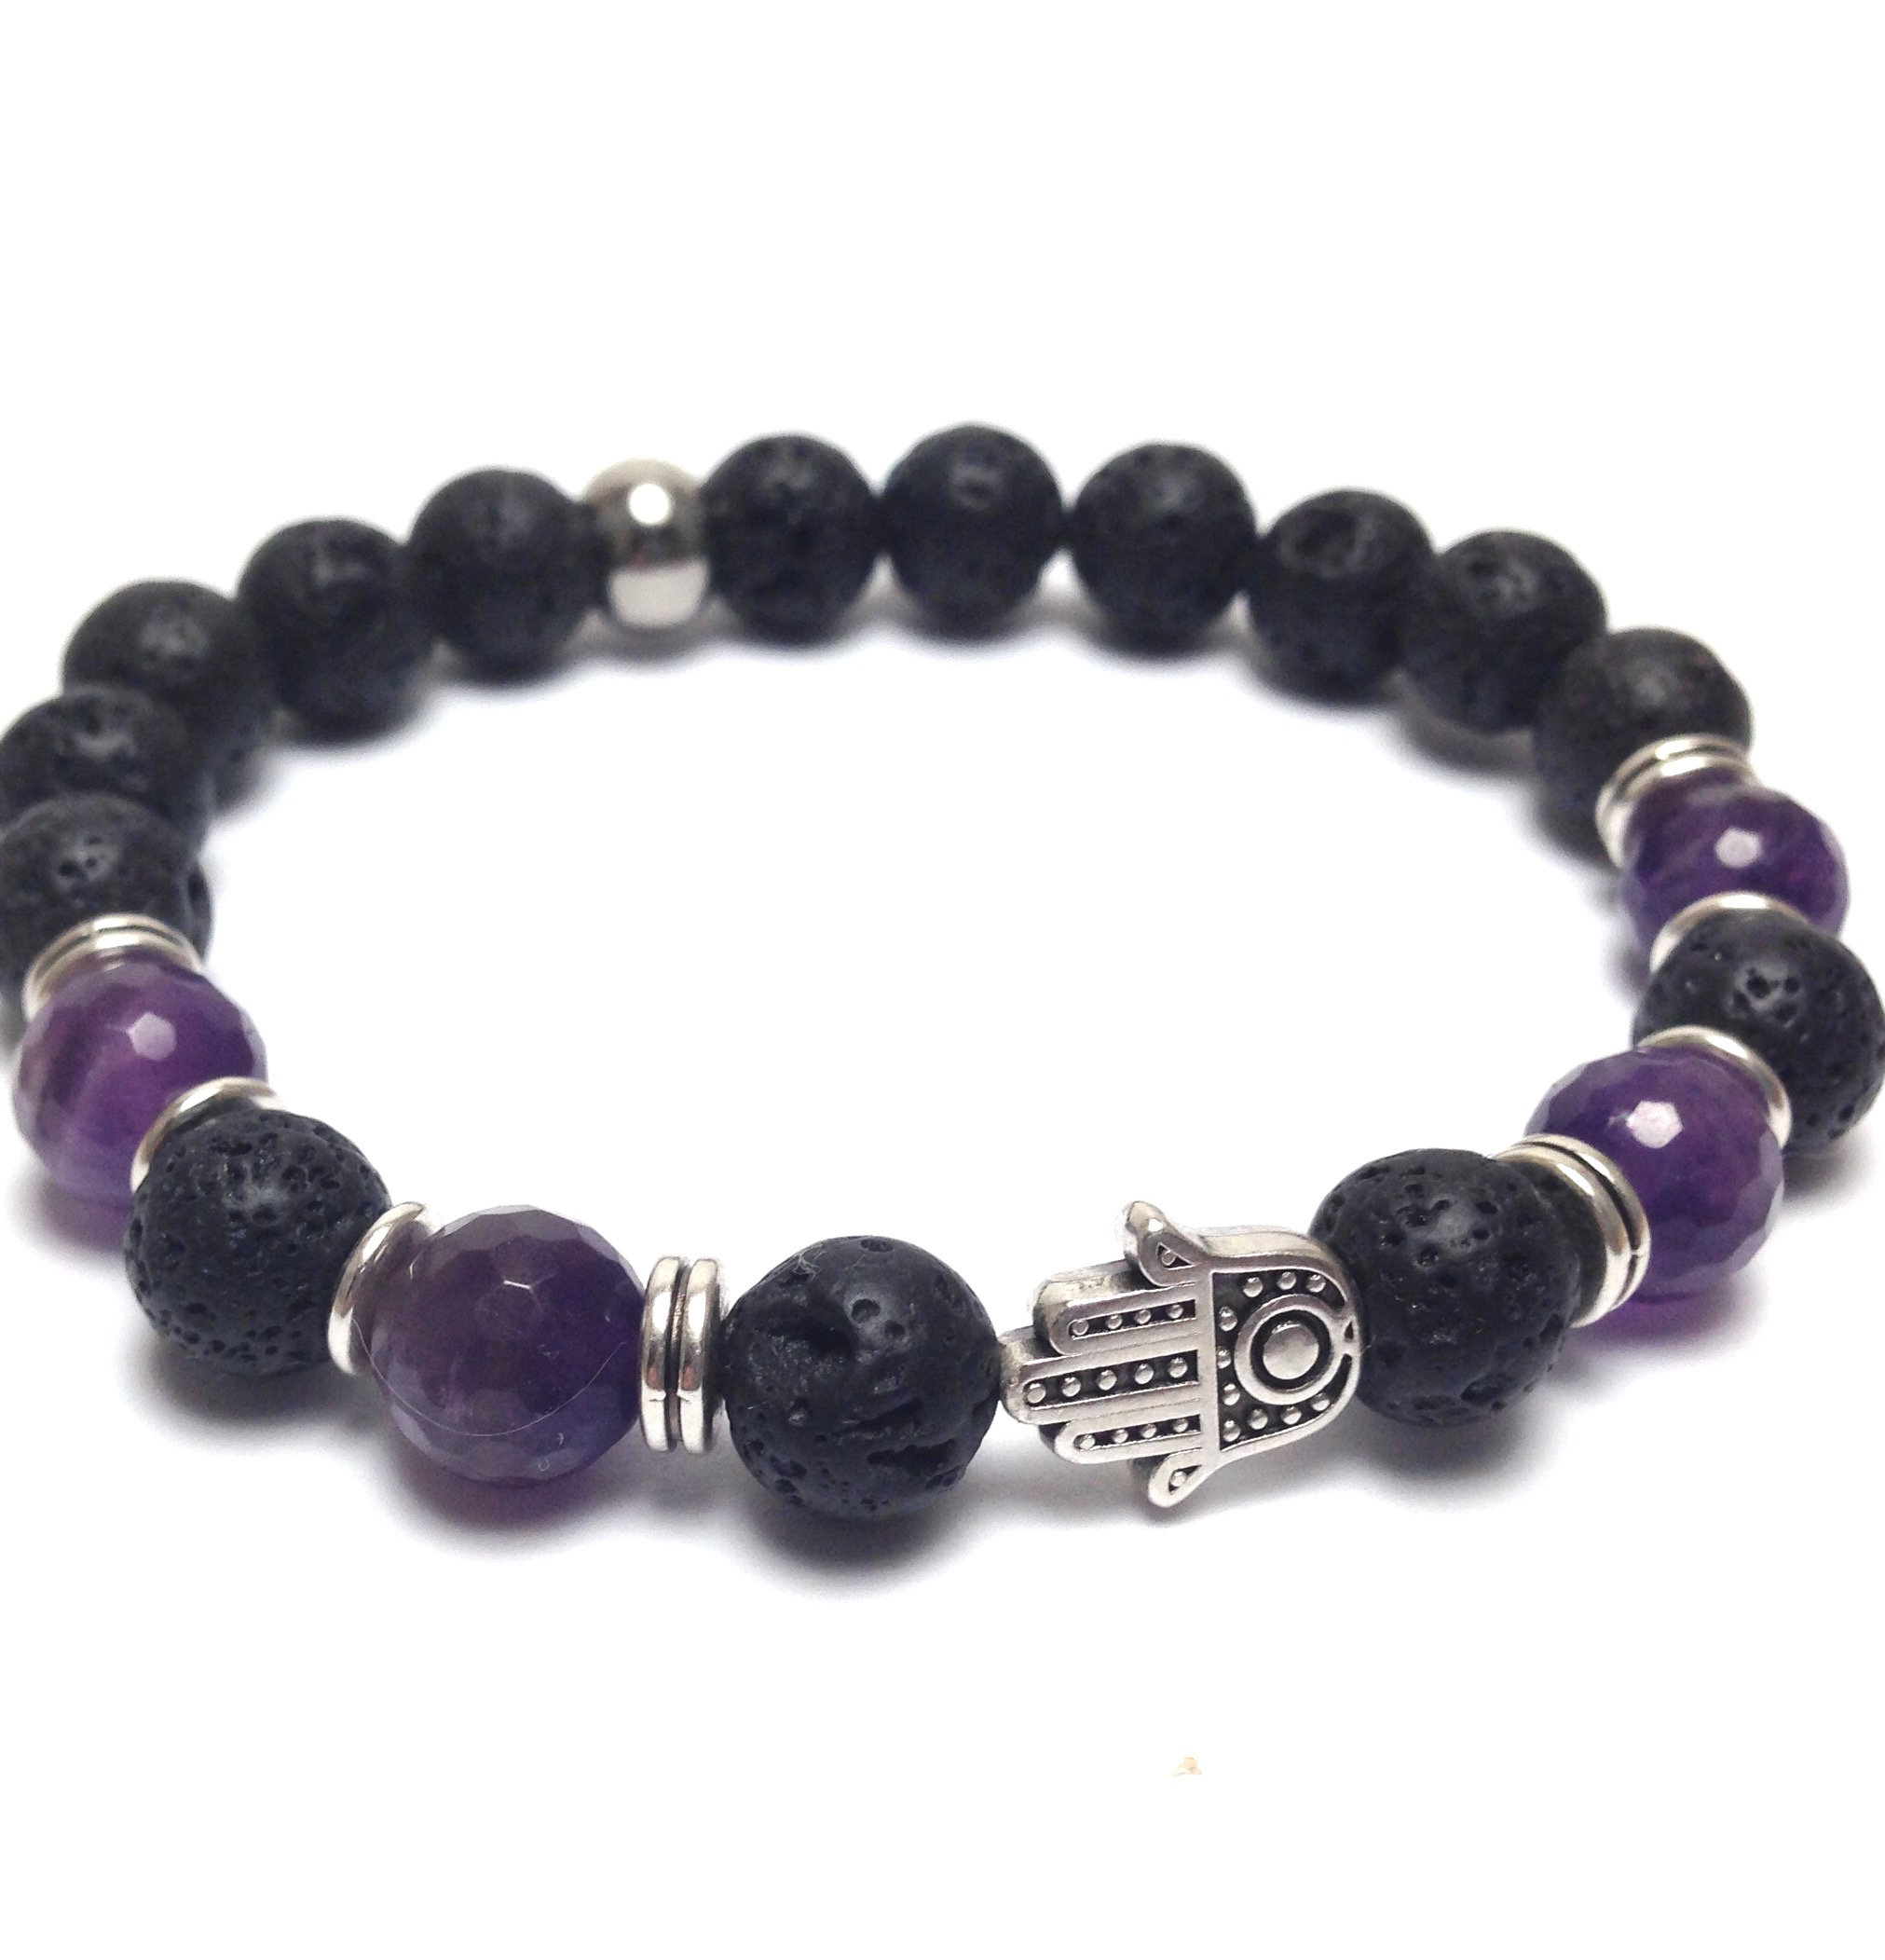 Hamsa hand amethyst and lava beads gemstone bracelet